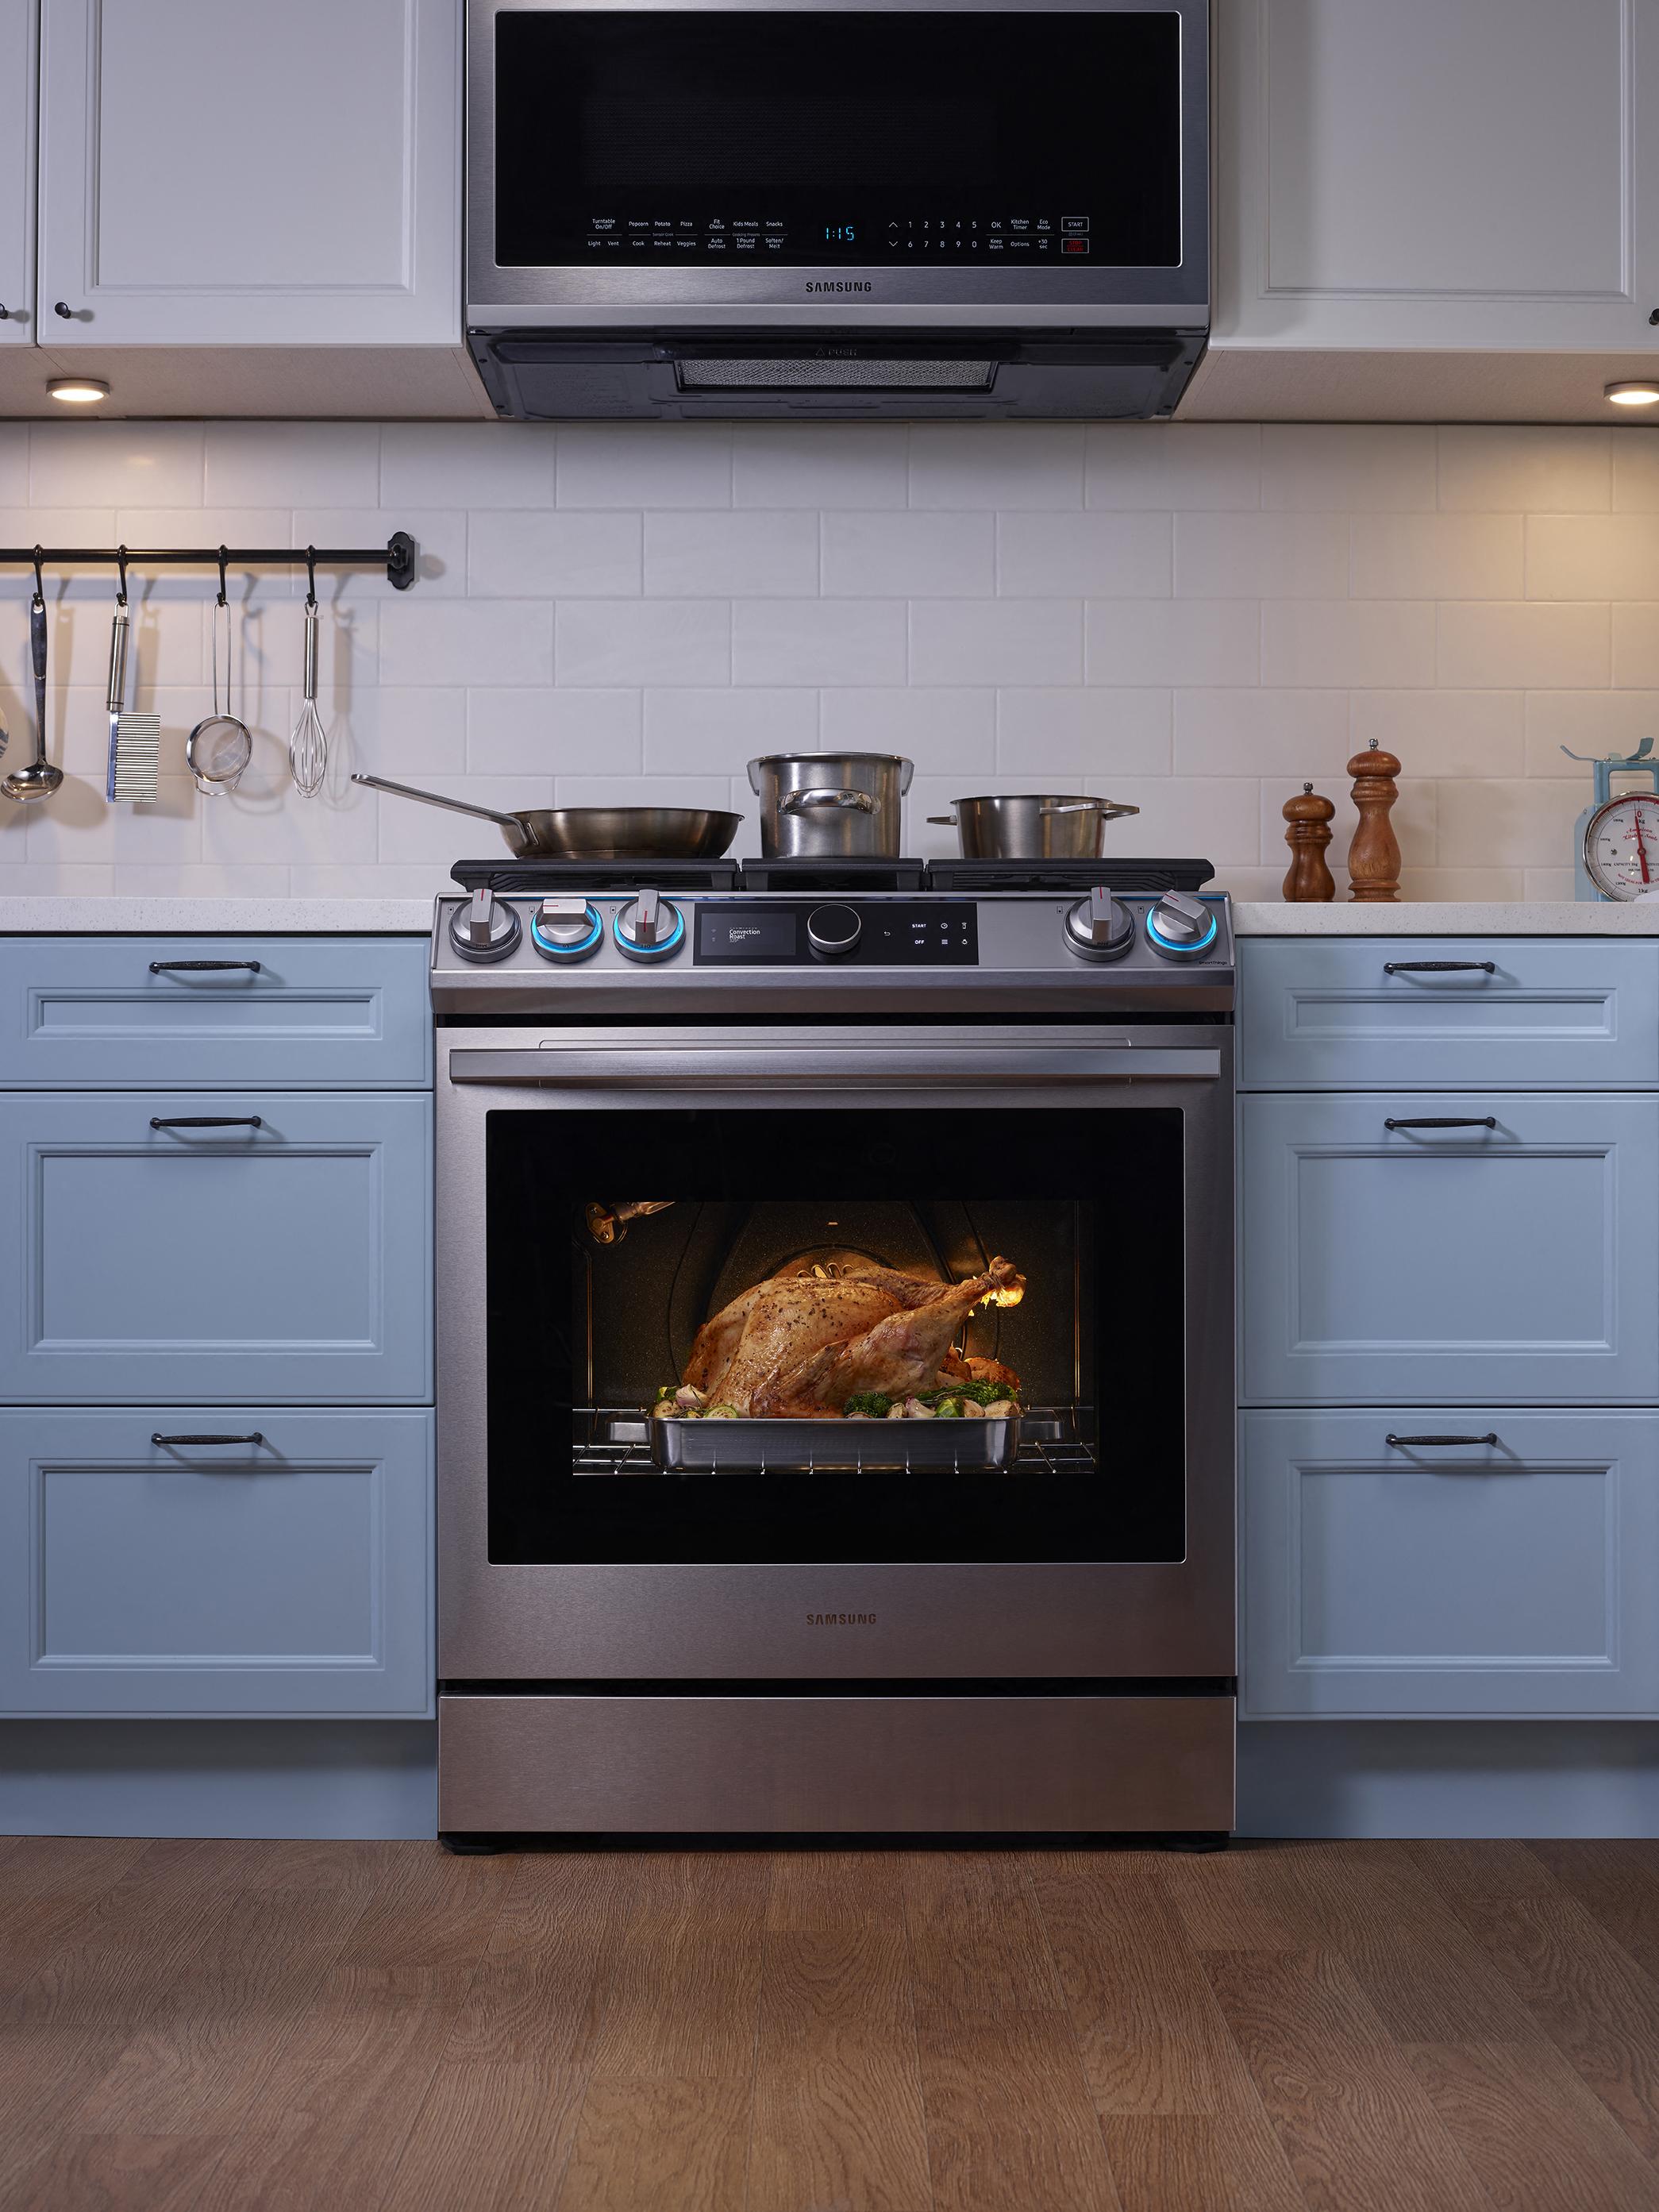 2020 Holiday Gift Guide - Home Appliance - Slide-in-Range